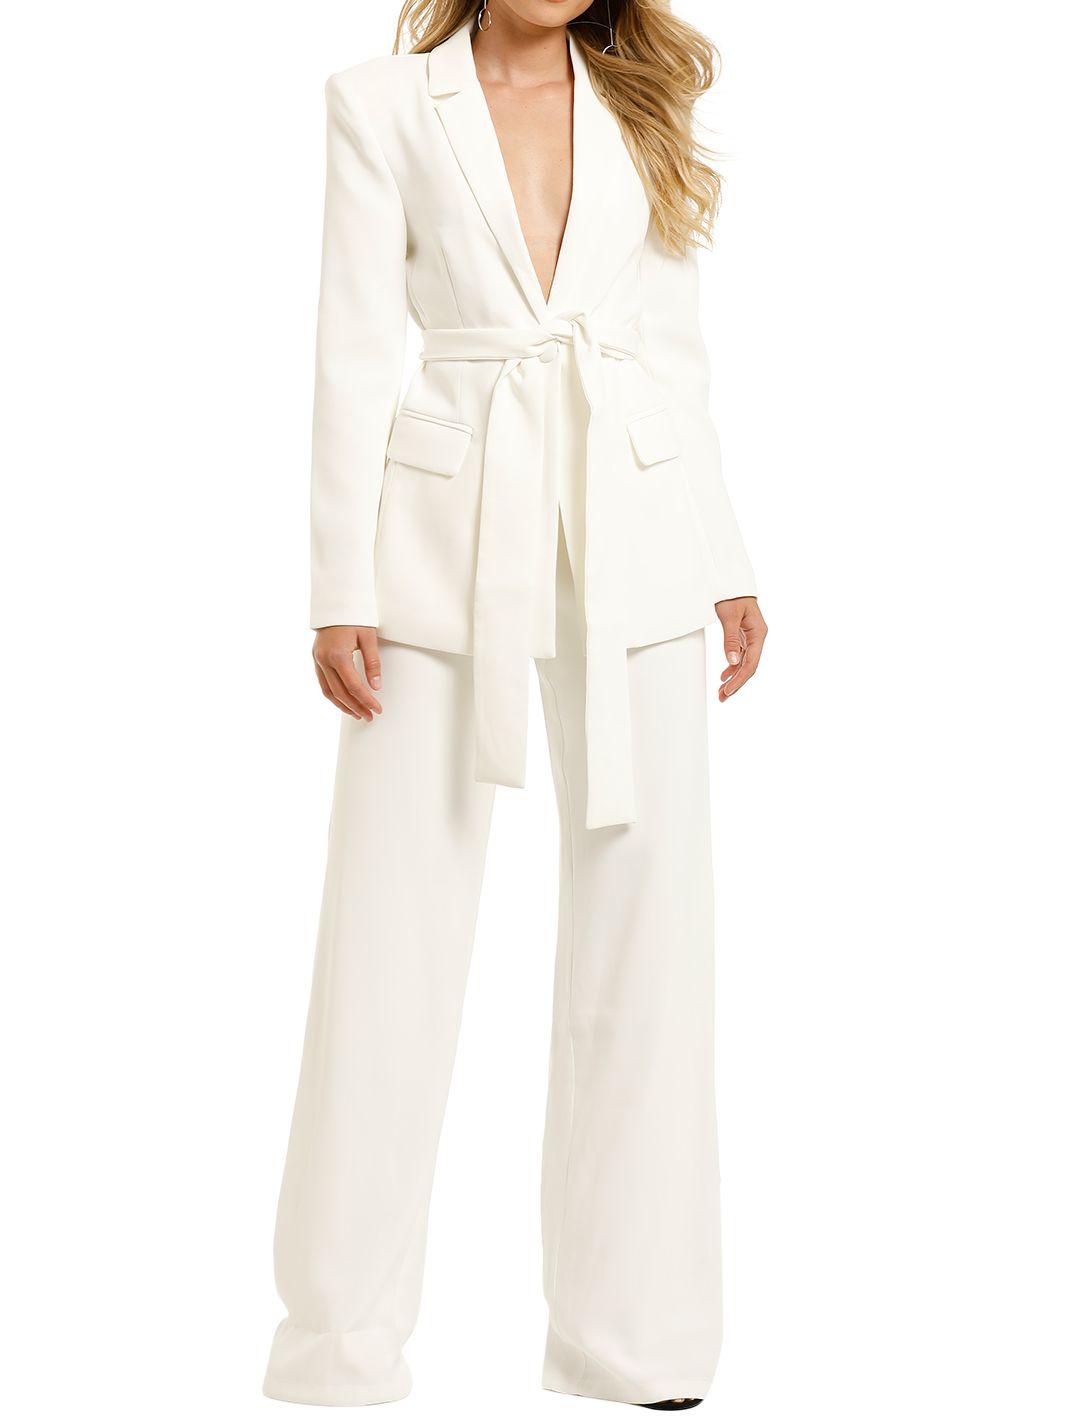 Bianca-and-Bridgett-Ella-Blazer-and-Pant-Set-White-Front